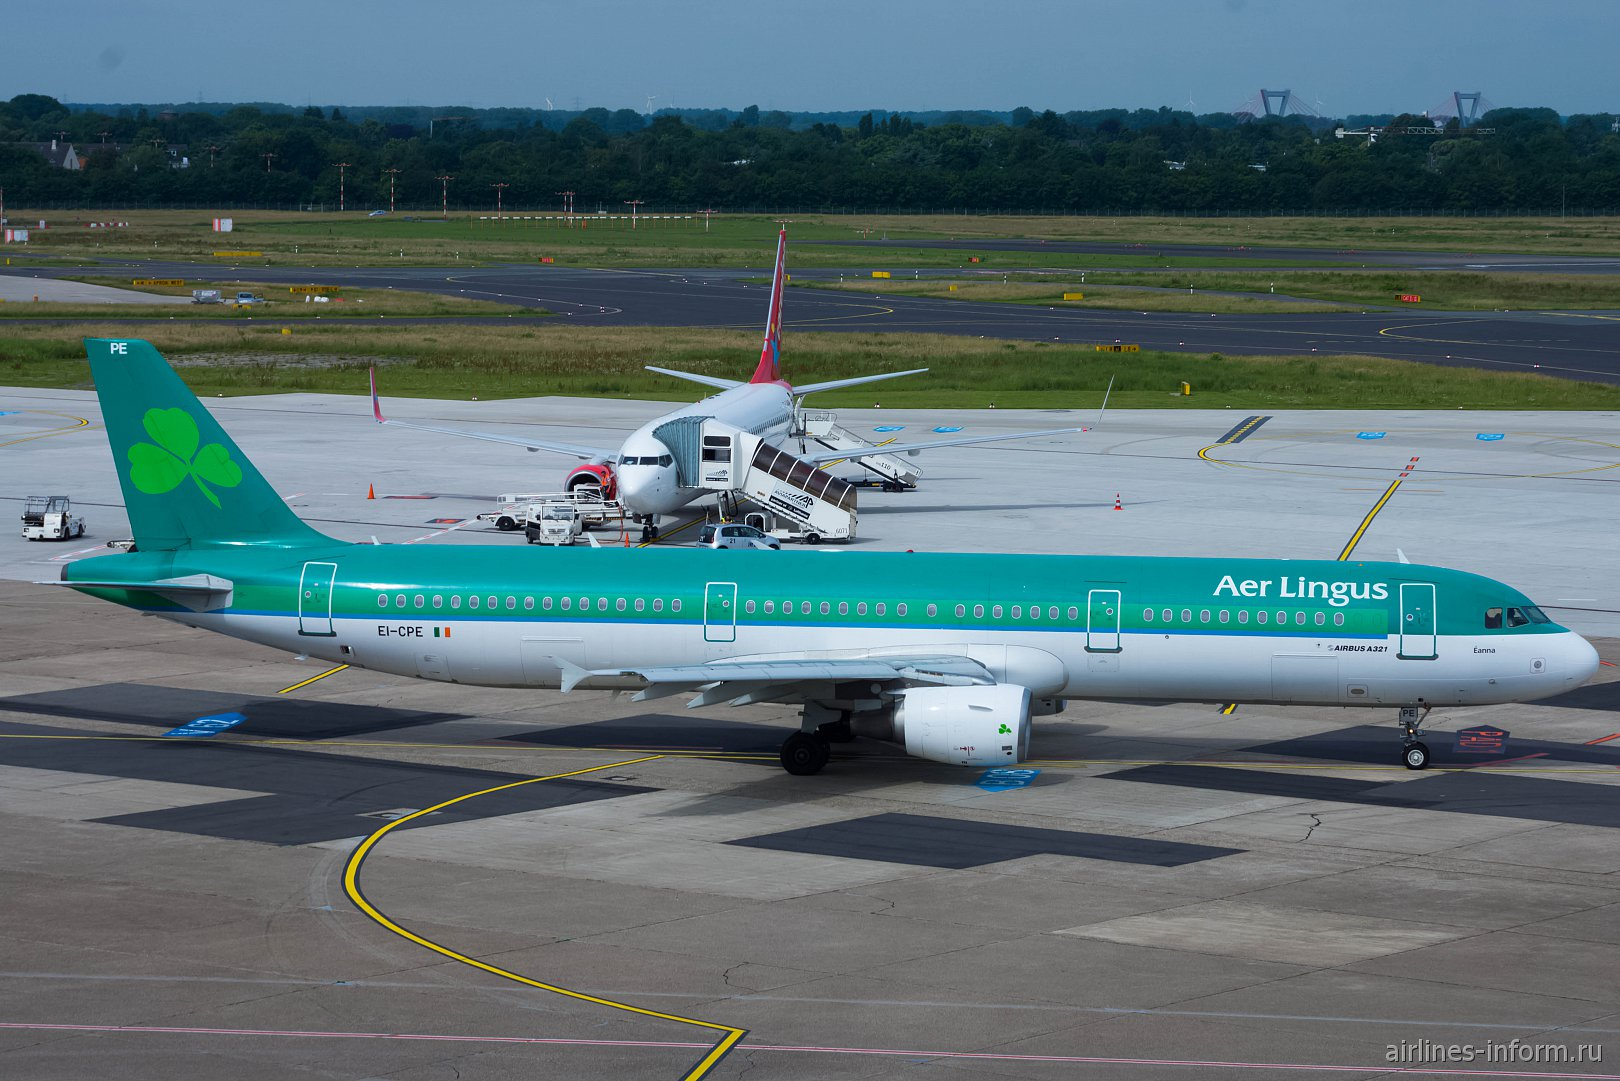 Airbus A321 EI-CPE авиакомпании Aer Lingus в аэропорту Дюссельдорфа